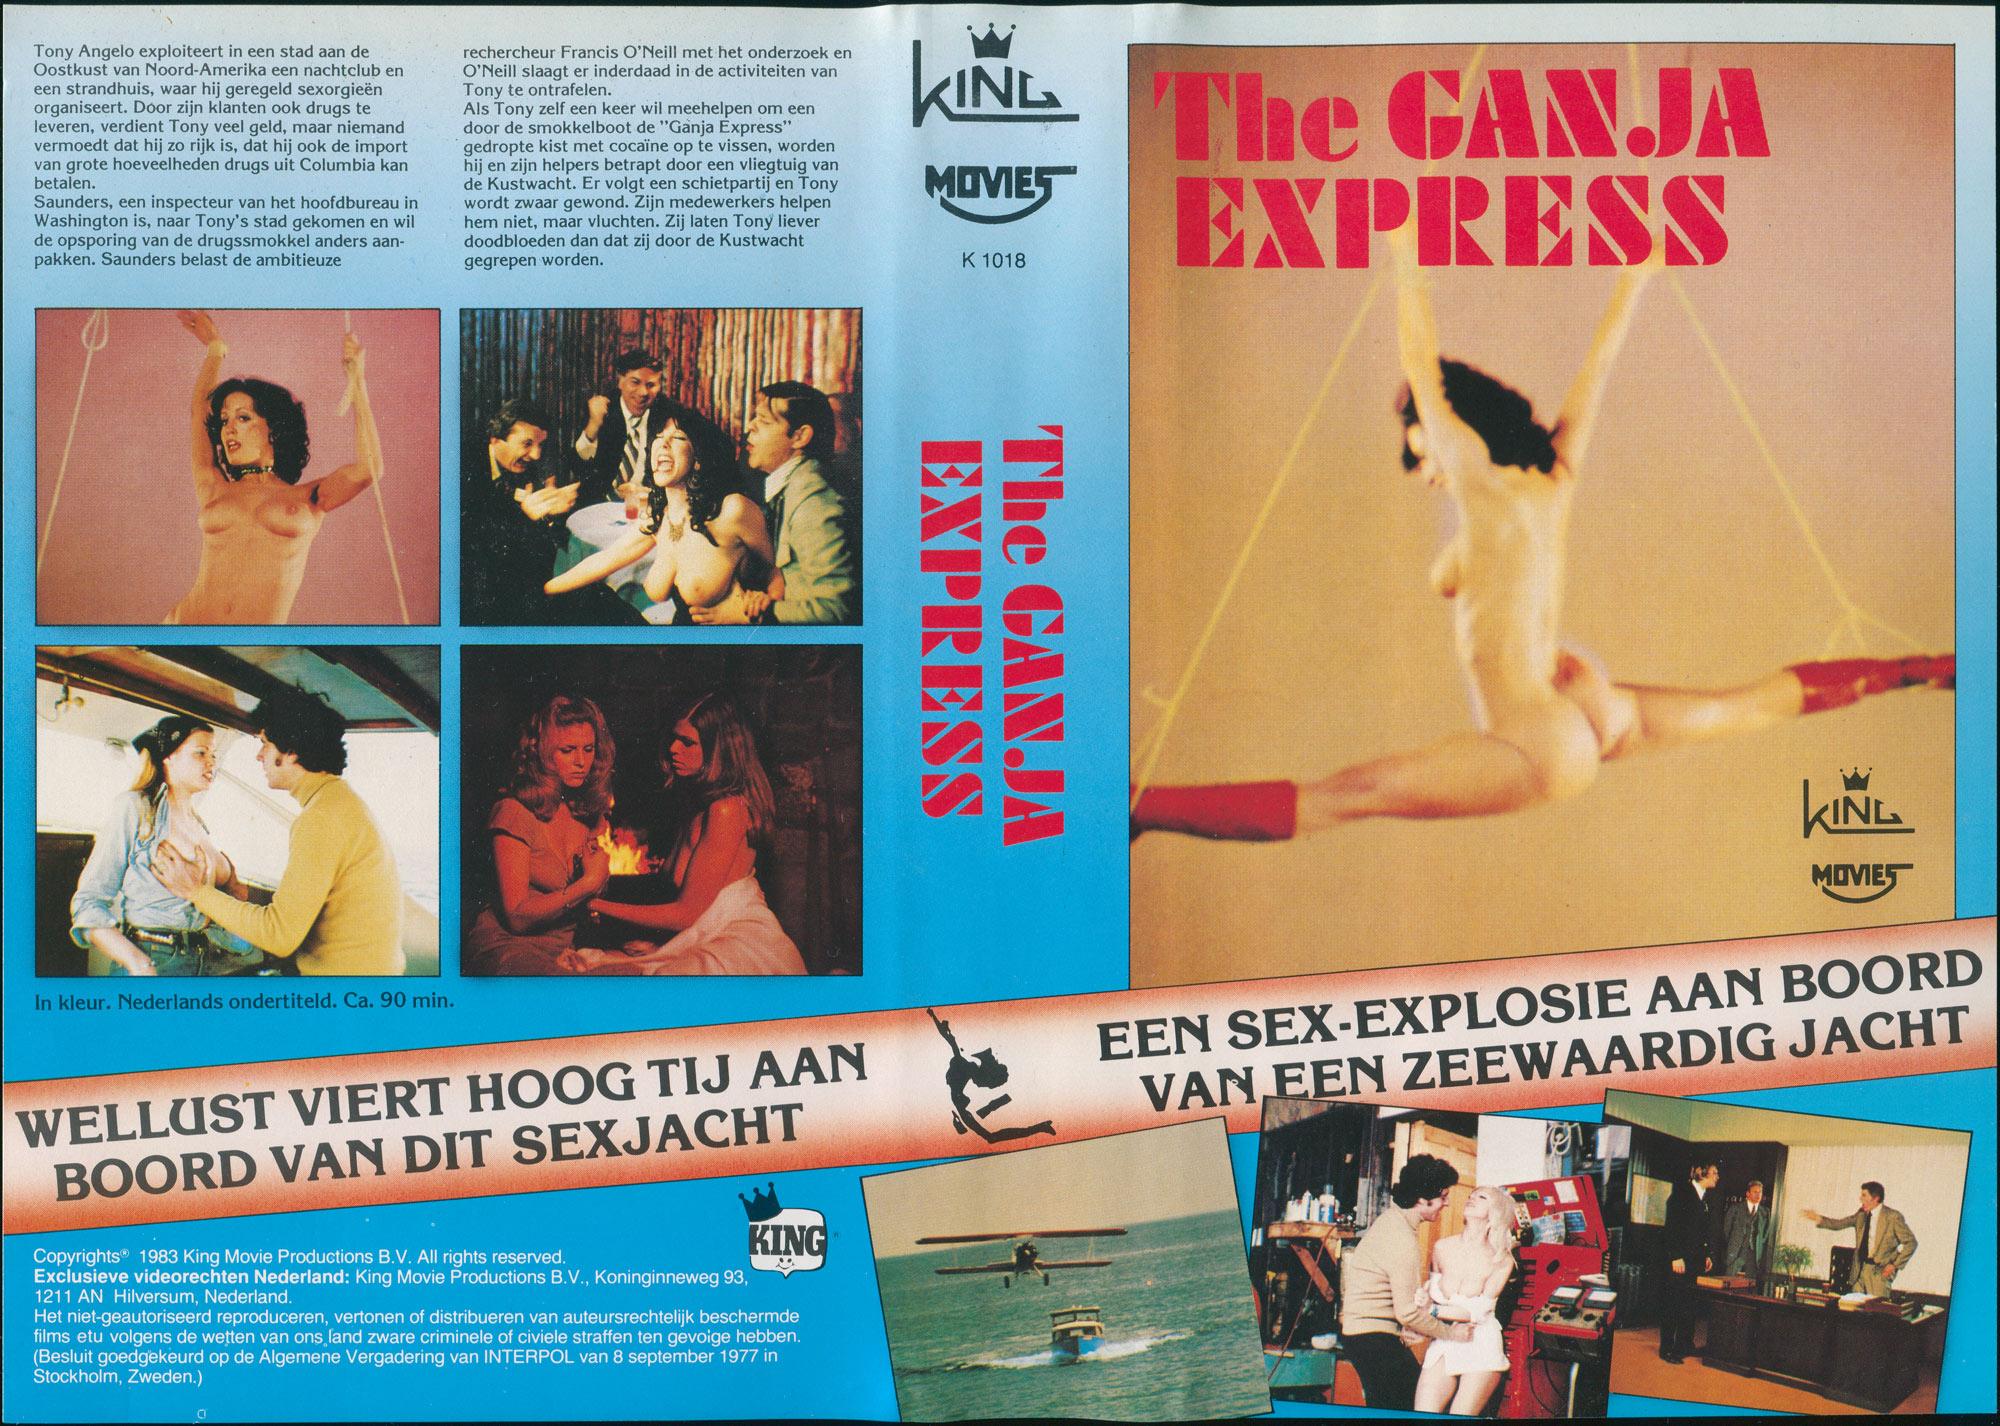 34798_The_Ganja_Express_1978_King_Movies_1983_K_1018_VHS_etu_cover_123_481lo.jpg